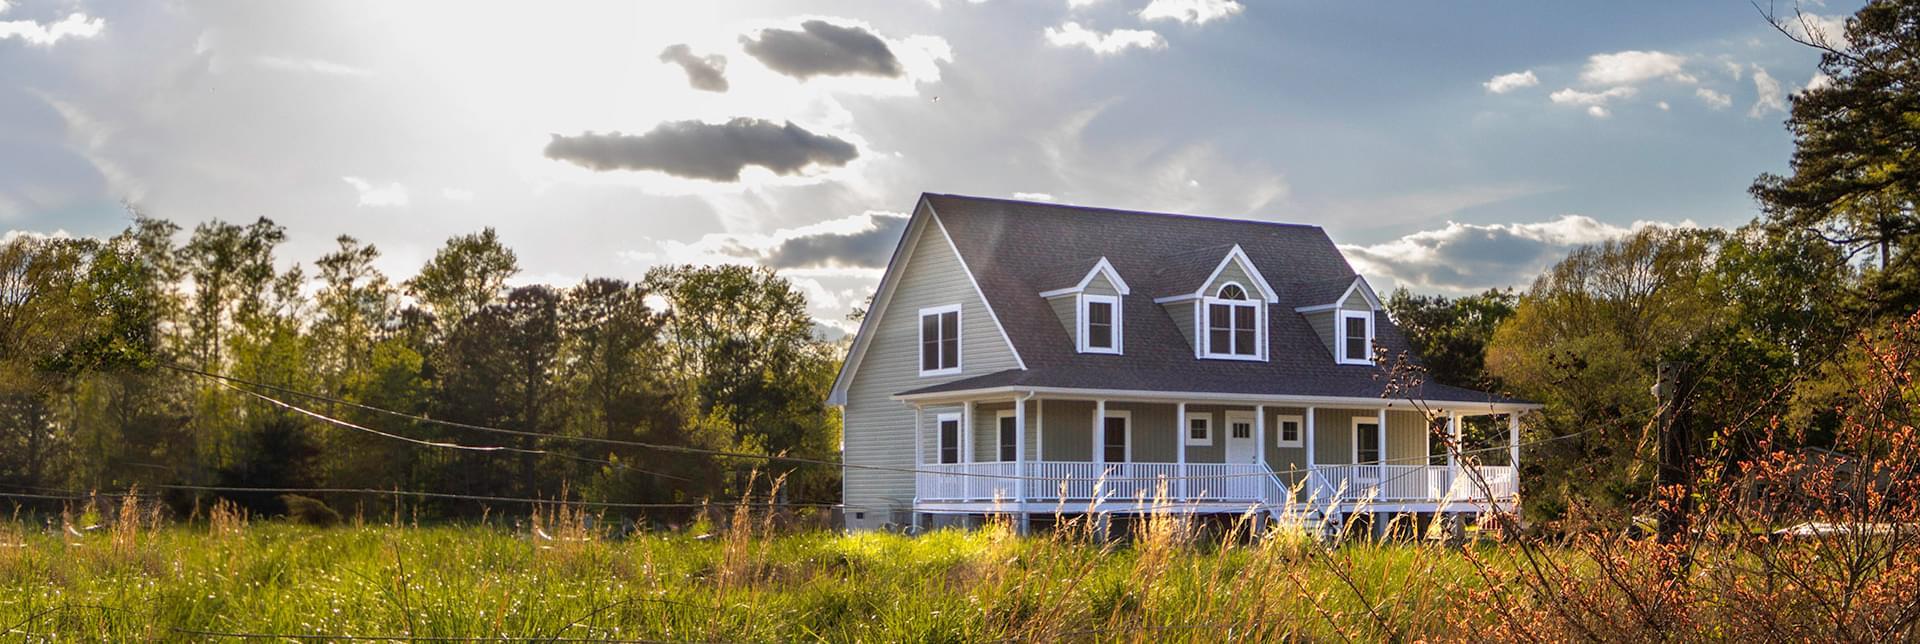 New Homes in Dinwiddie County VA